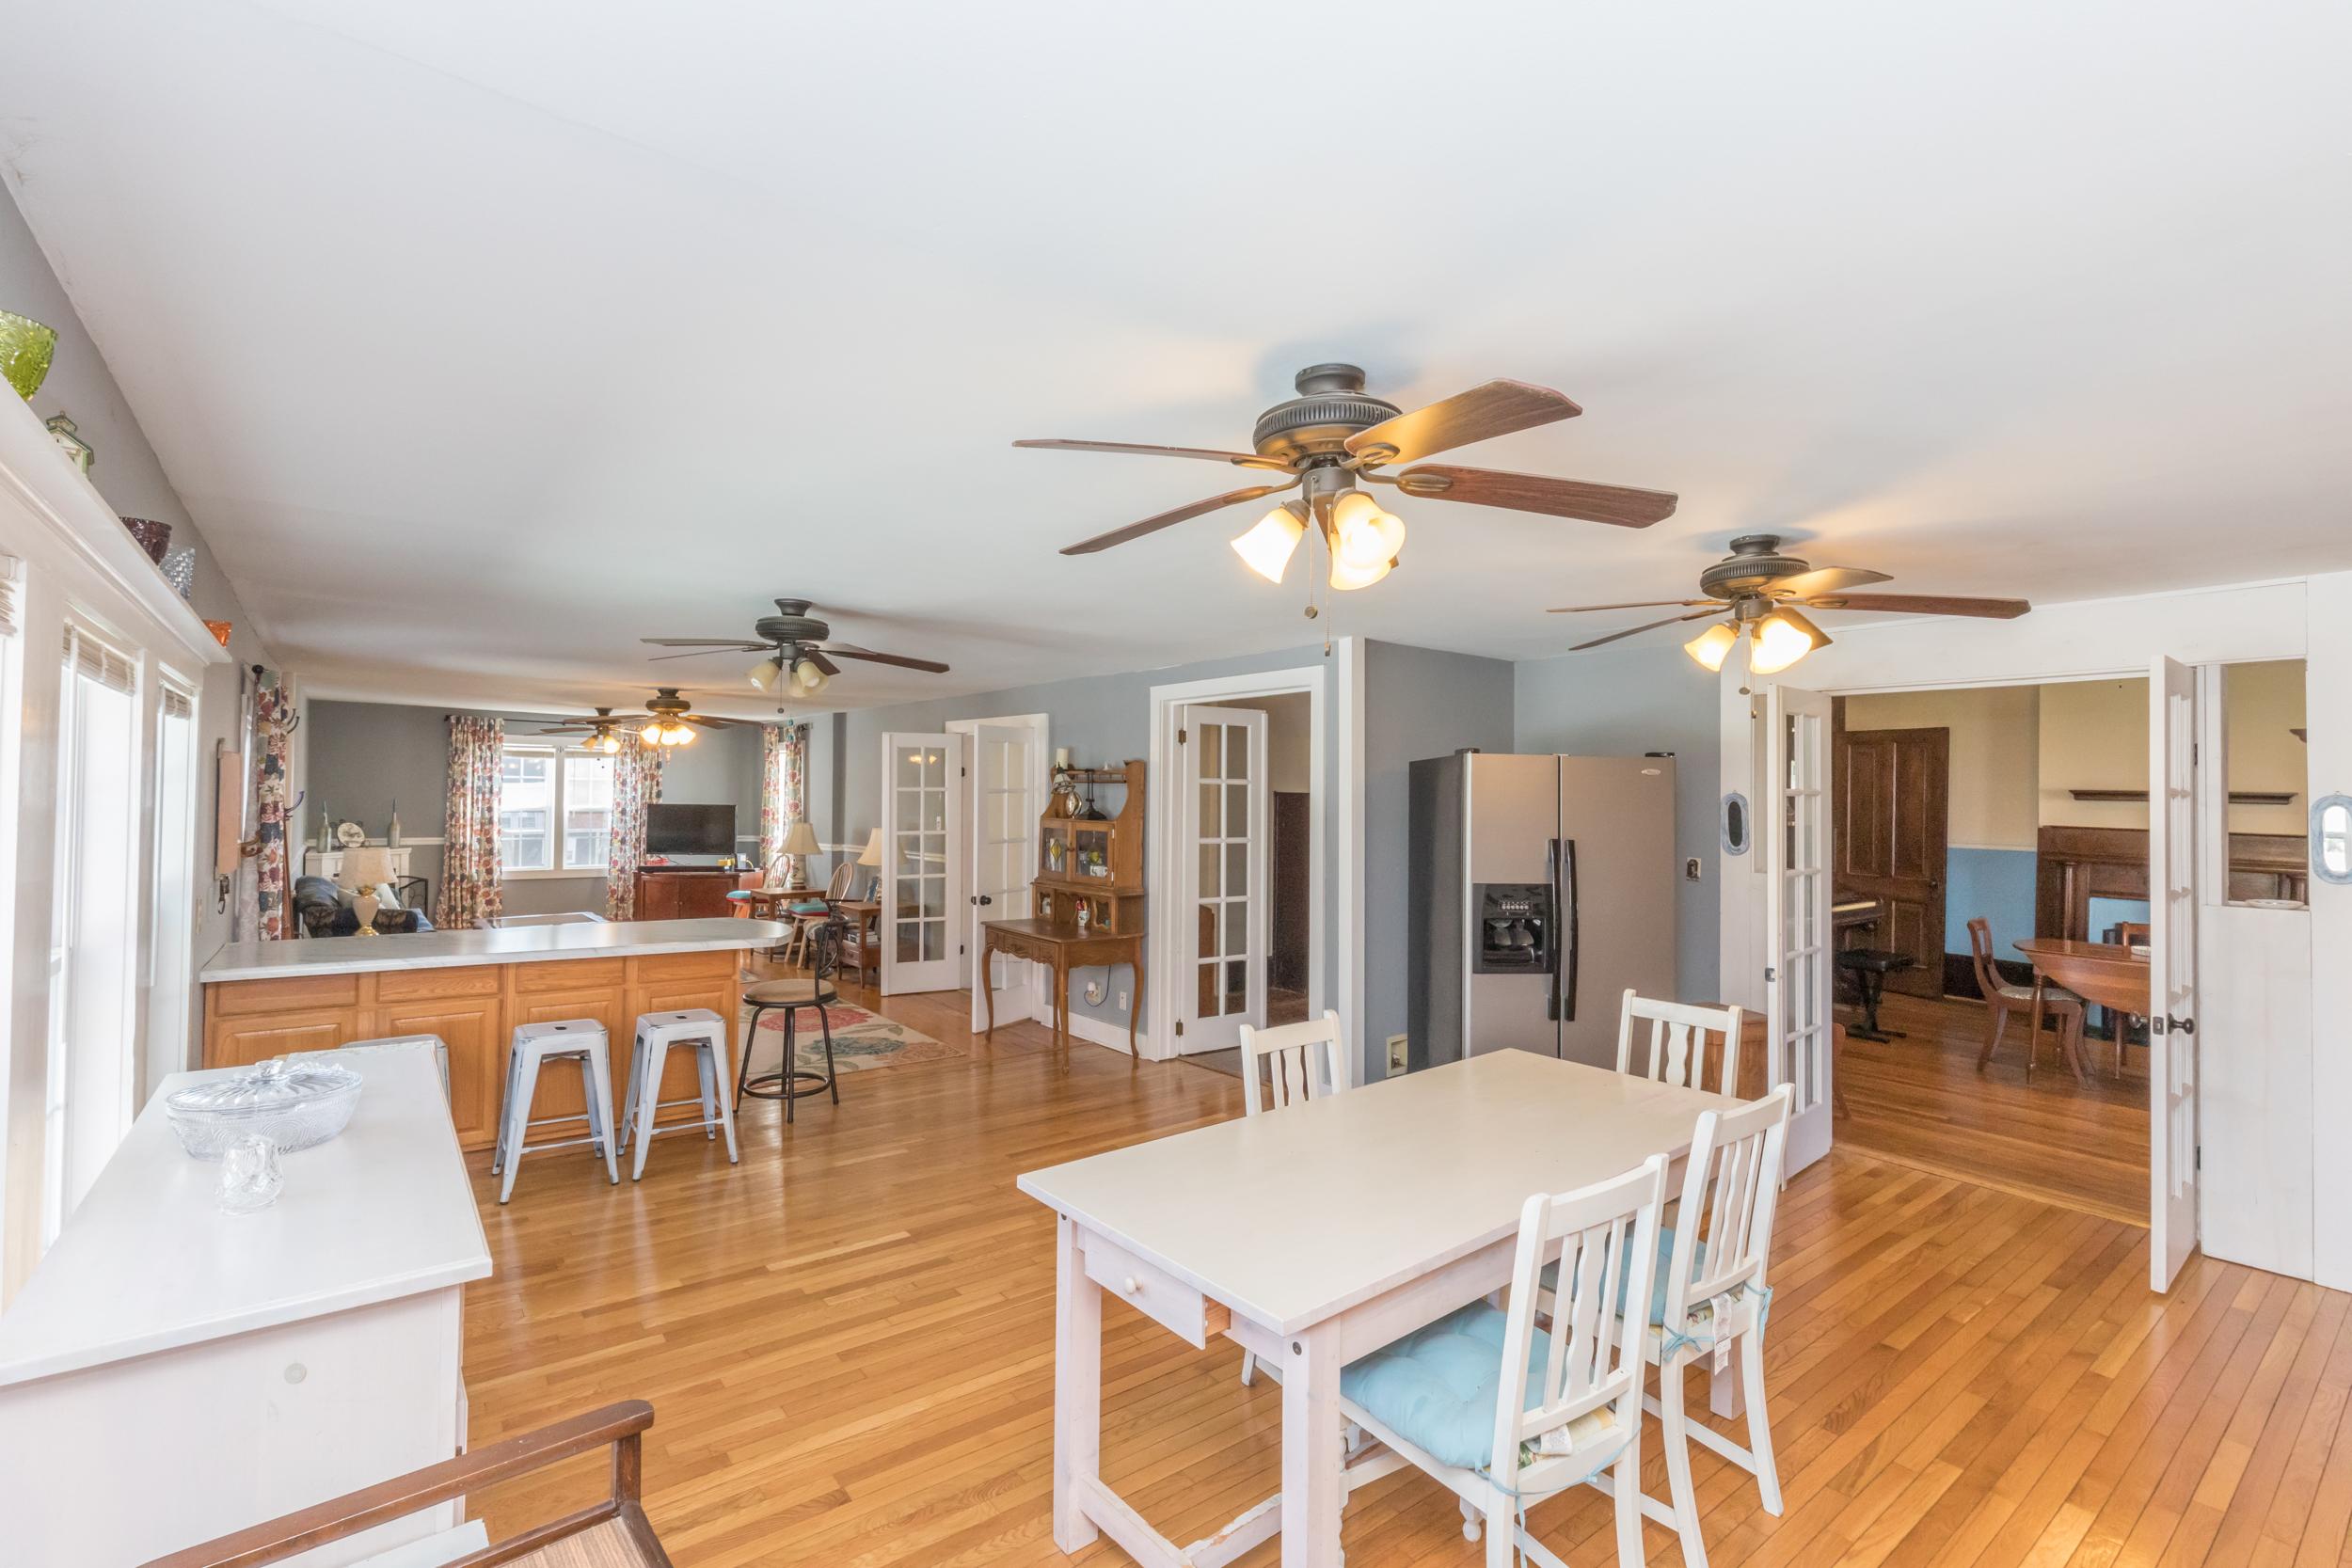 Gorgeous Restored 5 Bedroom Home In Glade Spring, VA